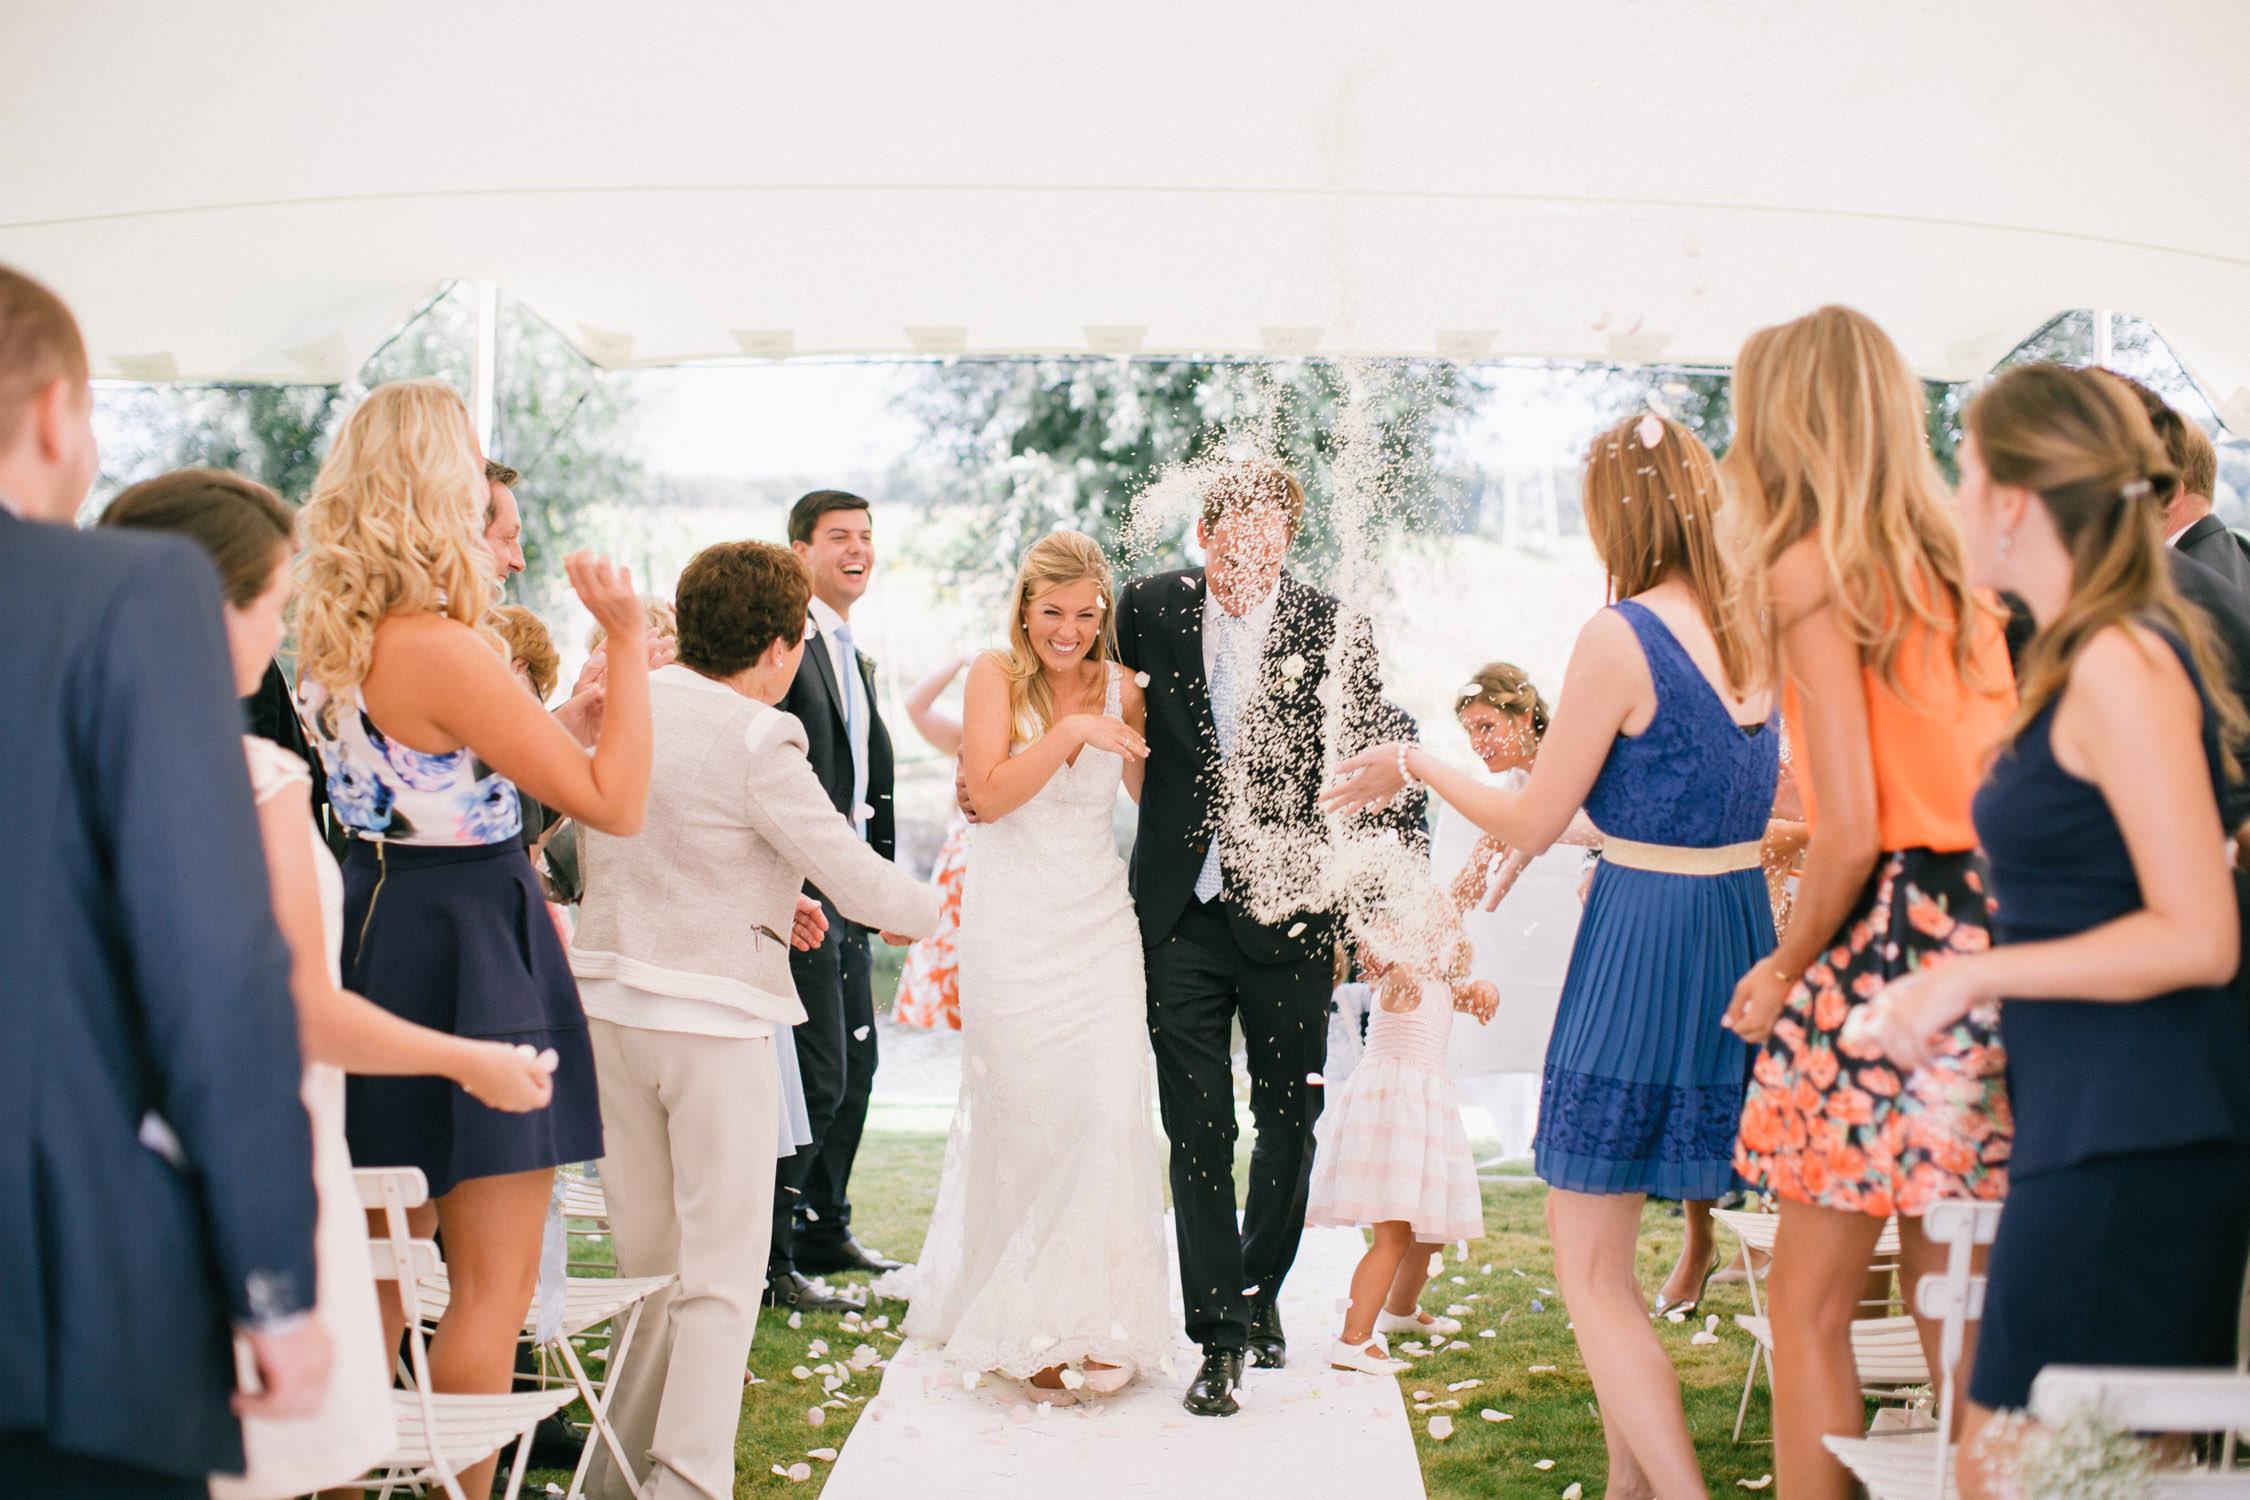 Huwelijksceremonie in 't-Goed Indoye, Wevelgem